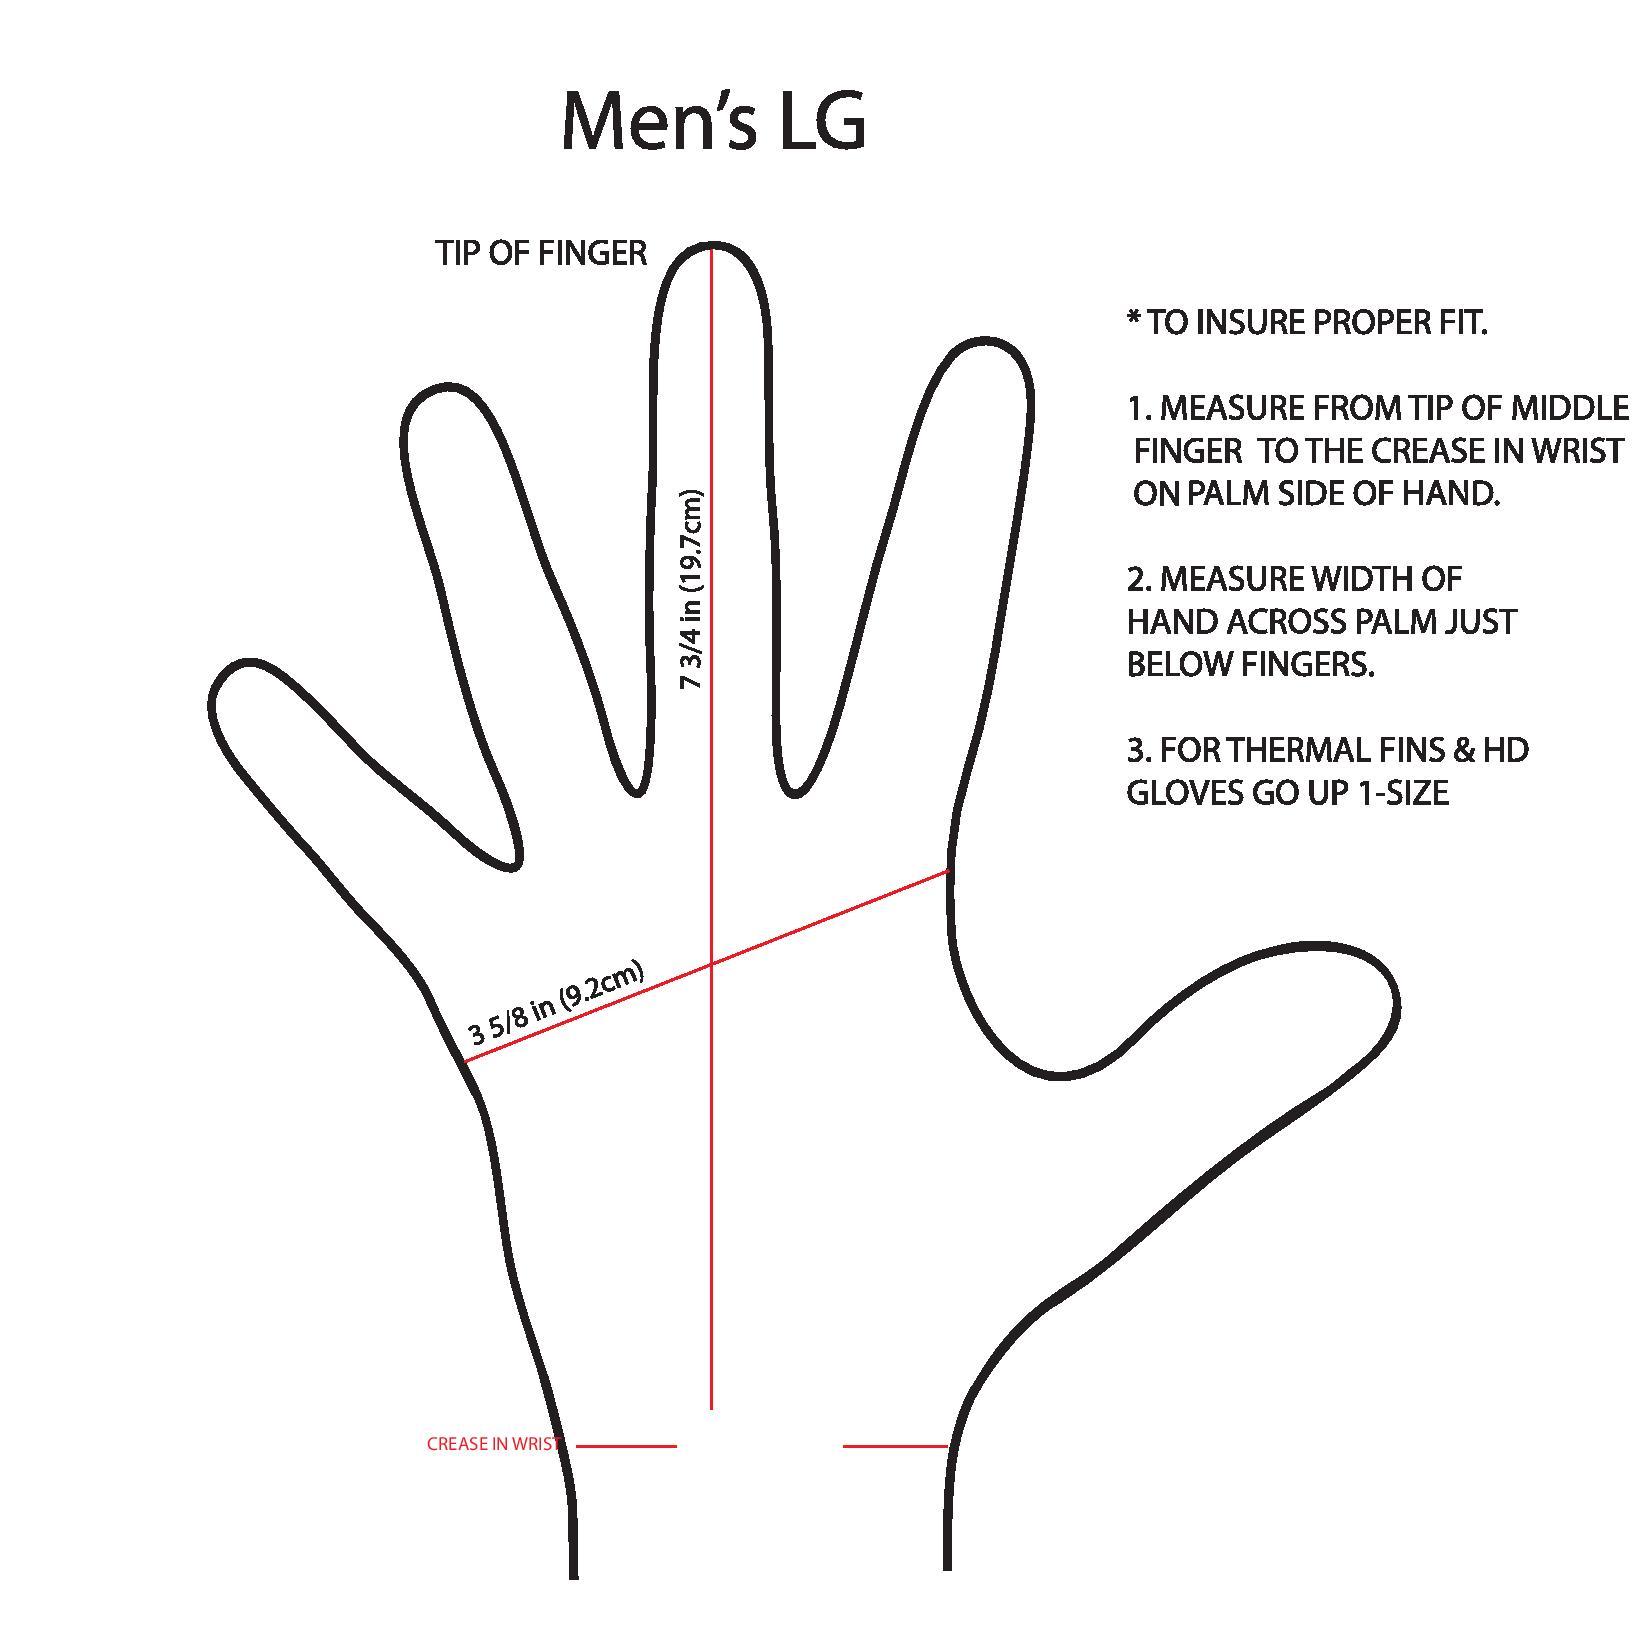 men-s-lg-page-001-2-.jpg